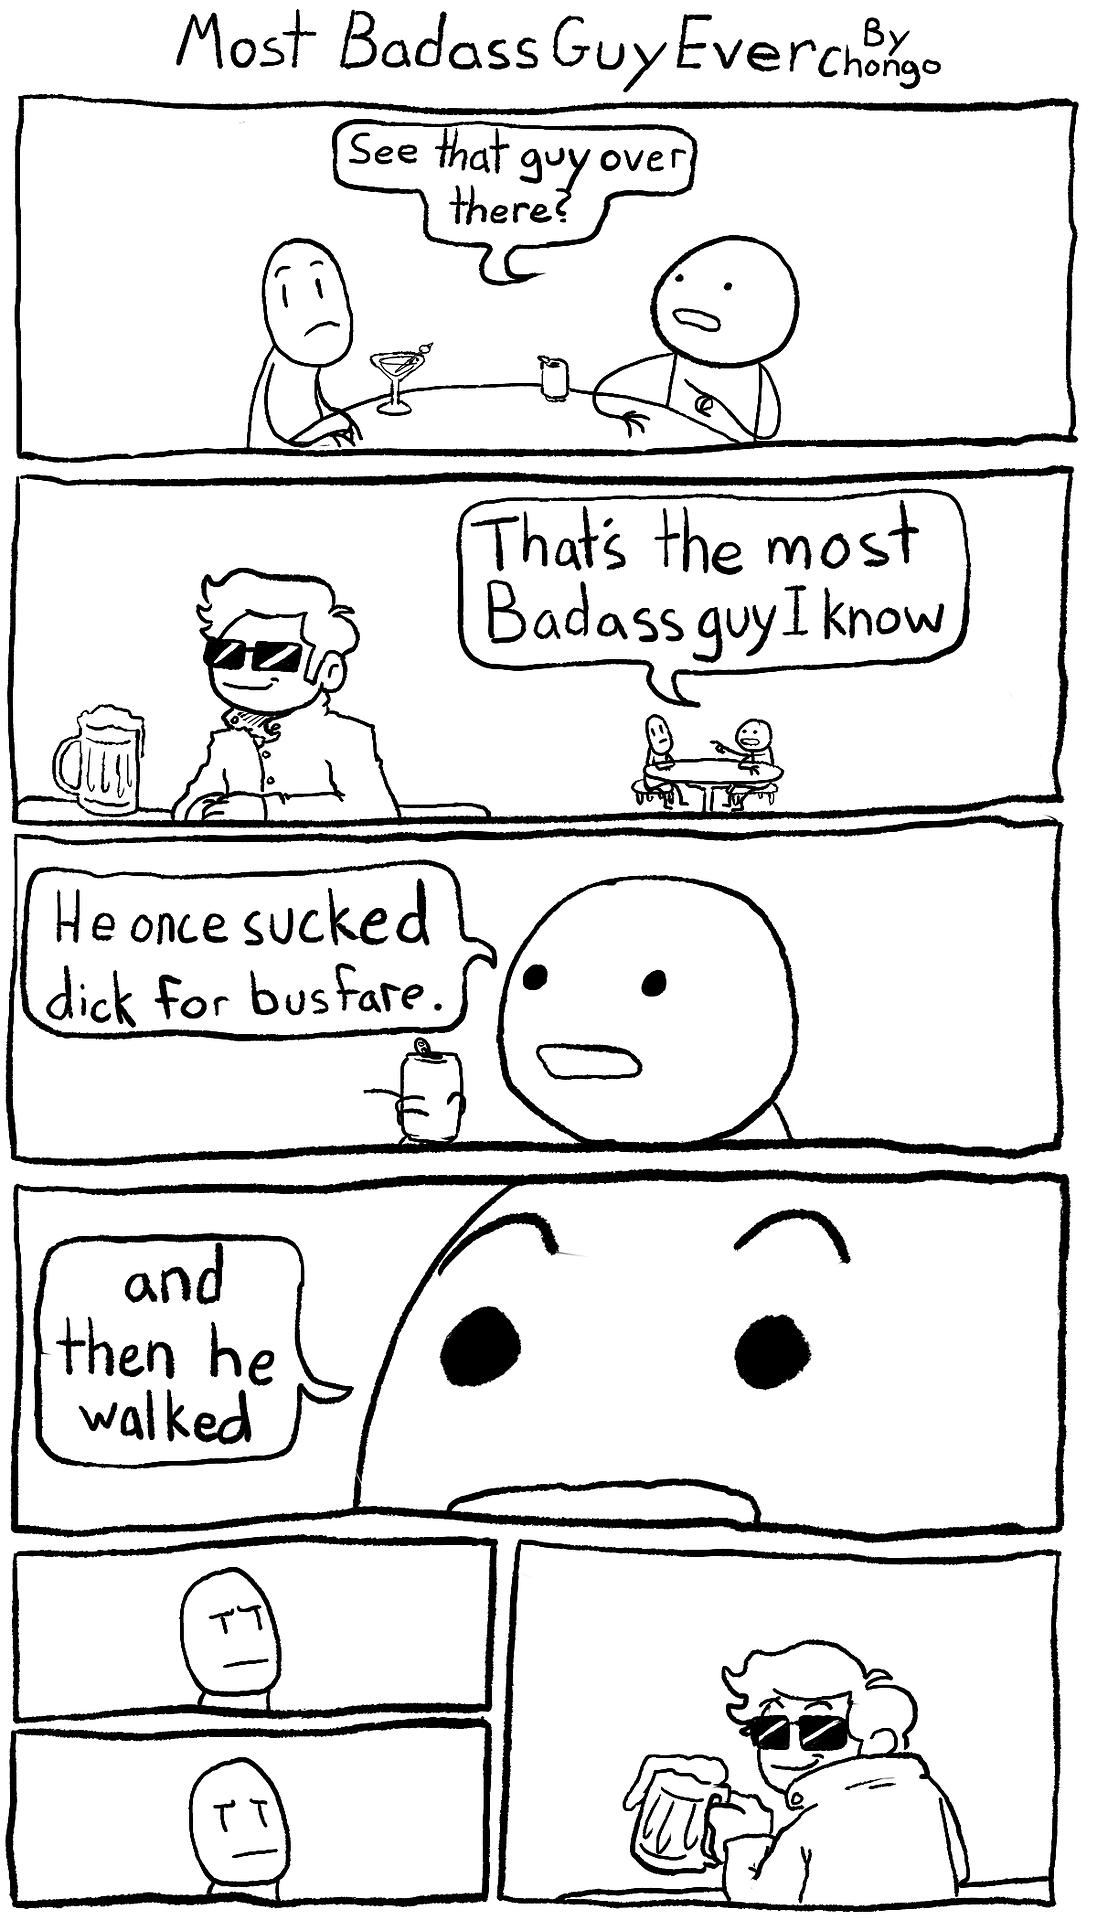 Repost. I giggled. Boloss Coy Eve rada, comic